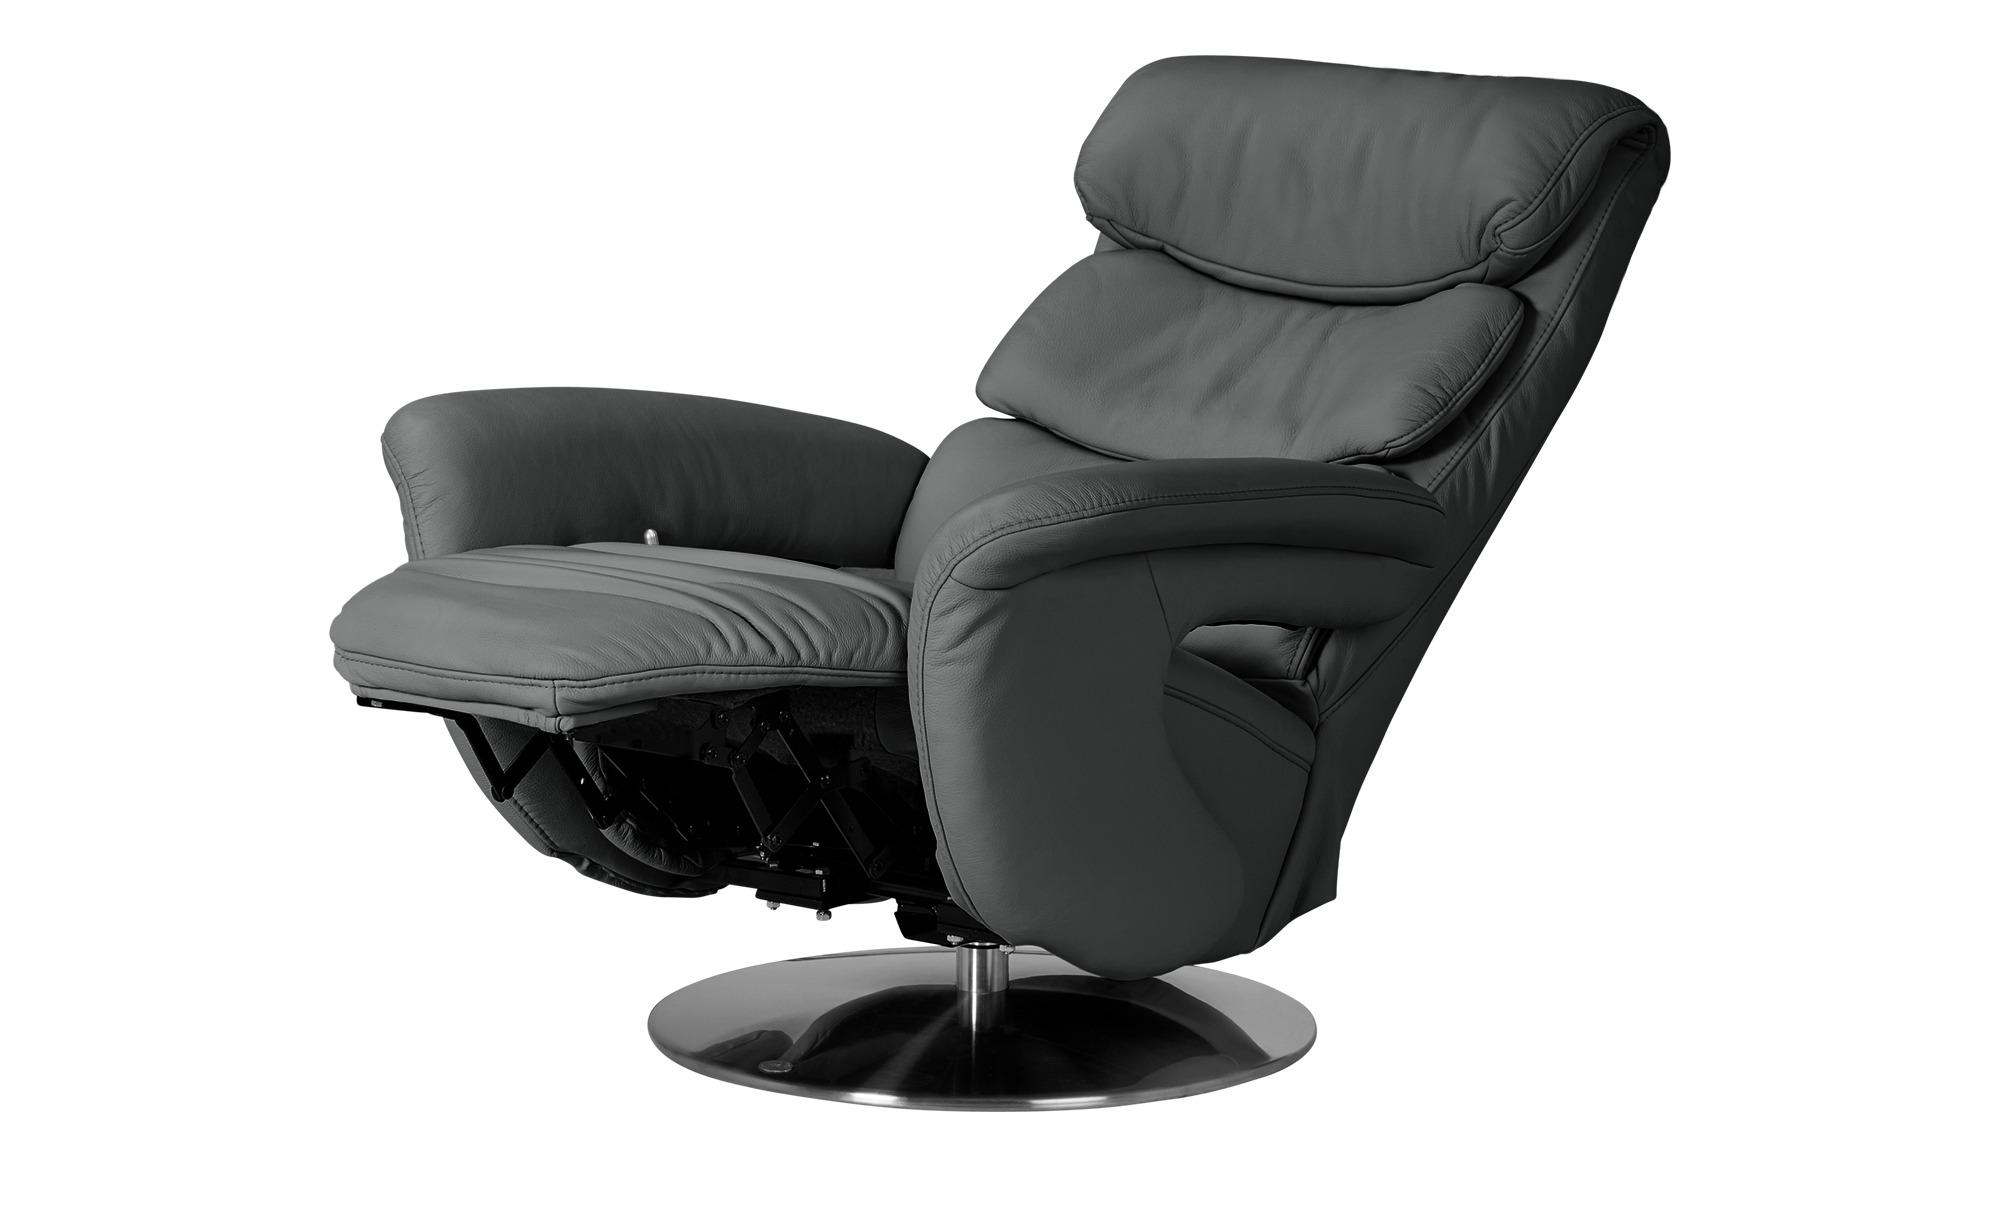 Leder-Relaxsessel grau - Leder Viktoria ¦ grau ¦ Maße (cm): B: 83 H: 113 T: 92 Polstermöbel > Sessel > Fernsehsessel - Höffner